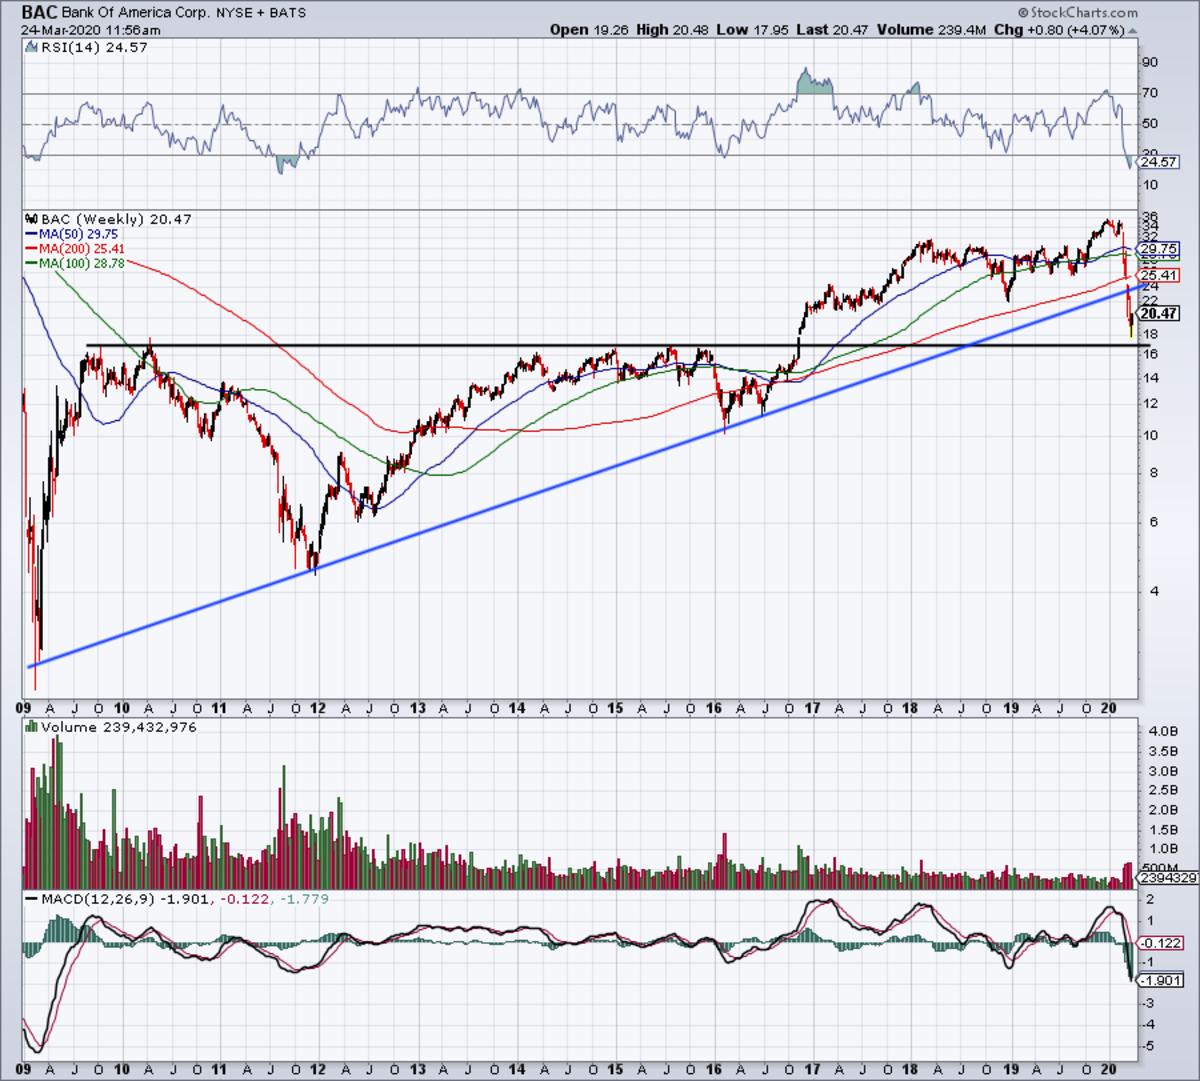 Long-term weekly chart of Bank of America.